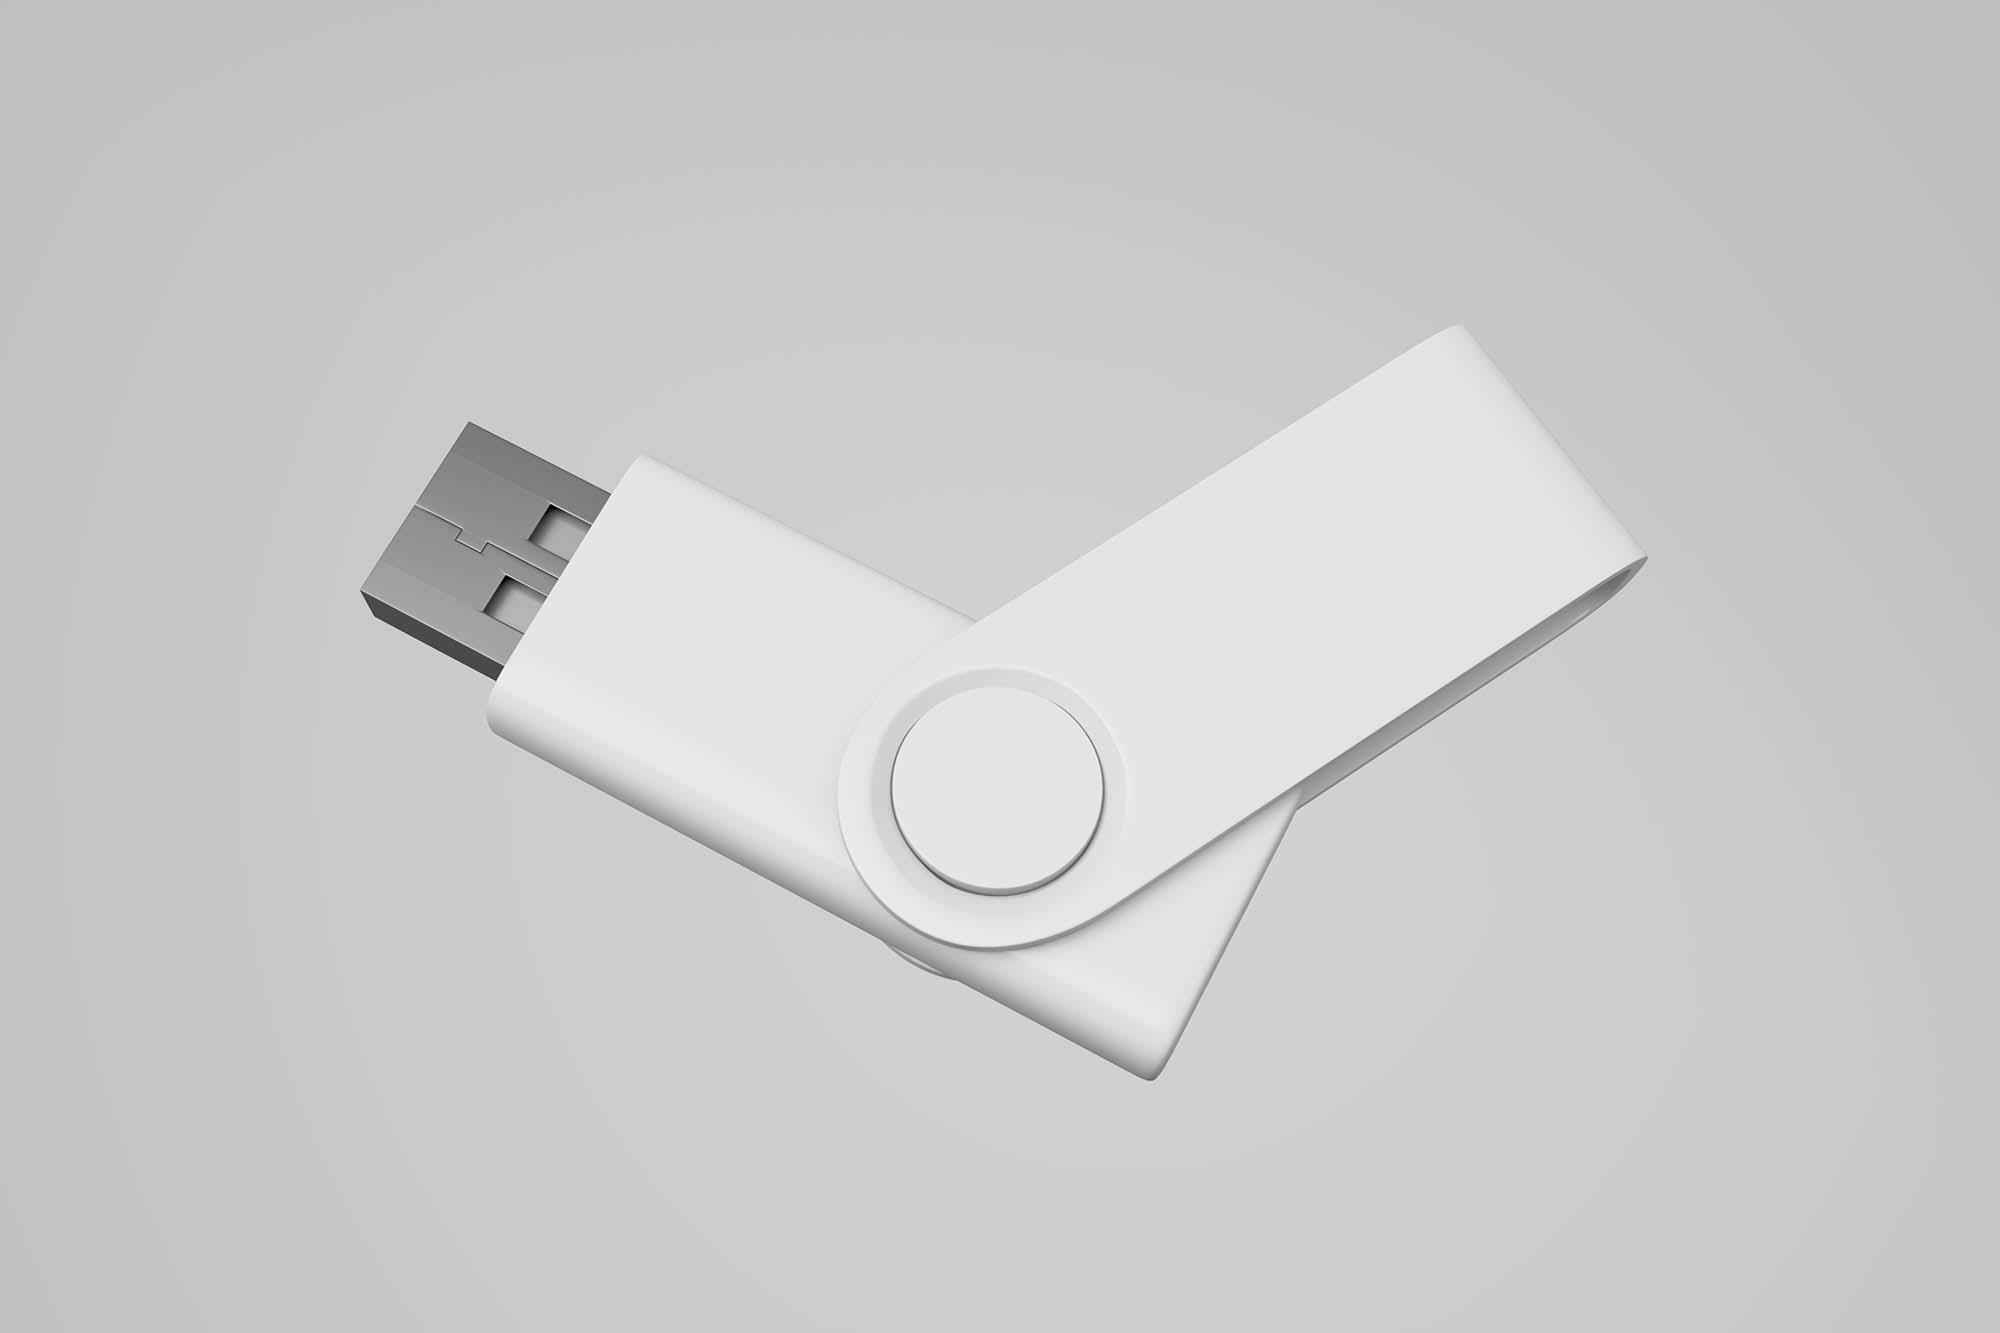 USB Card Mockup 2